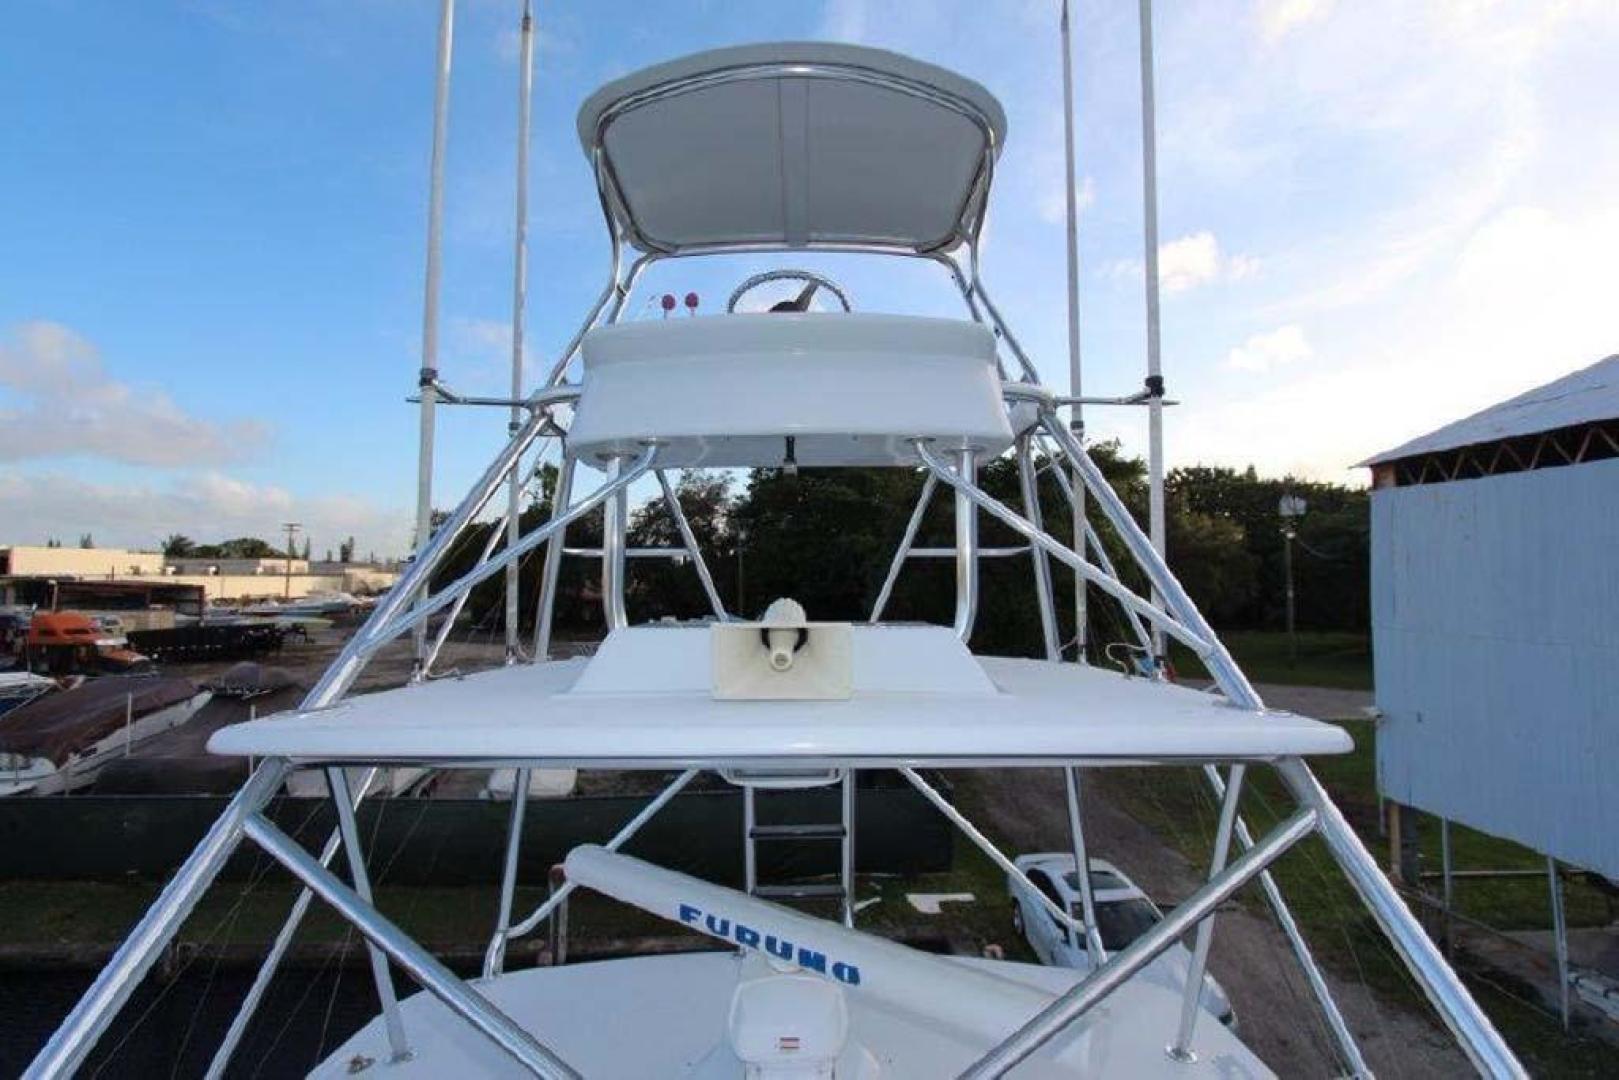 Hatteras-Enclosed Bridge 2002-El Bohemio Miami-Florida-United States-Tower-369544 | Thumbnail